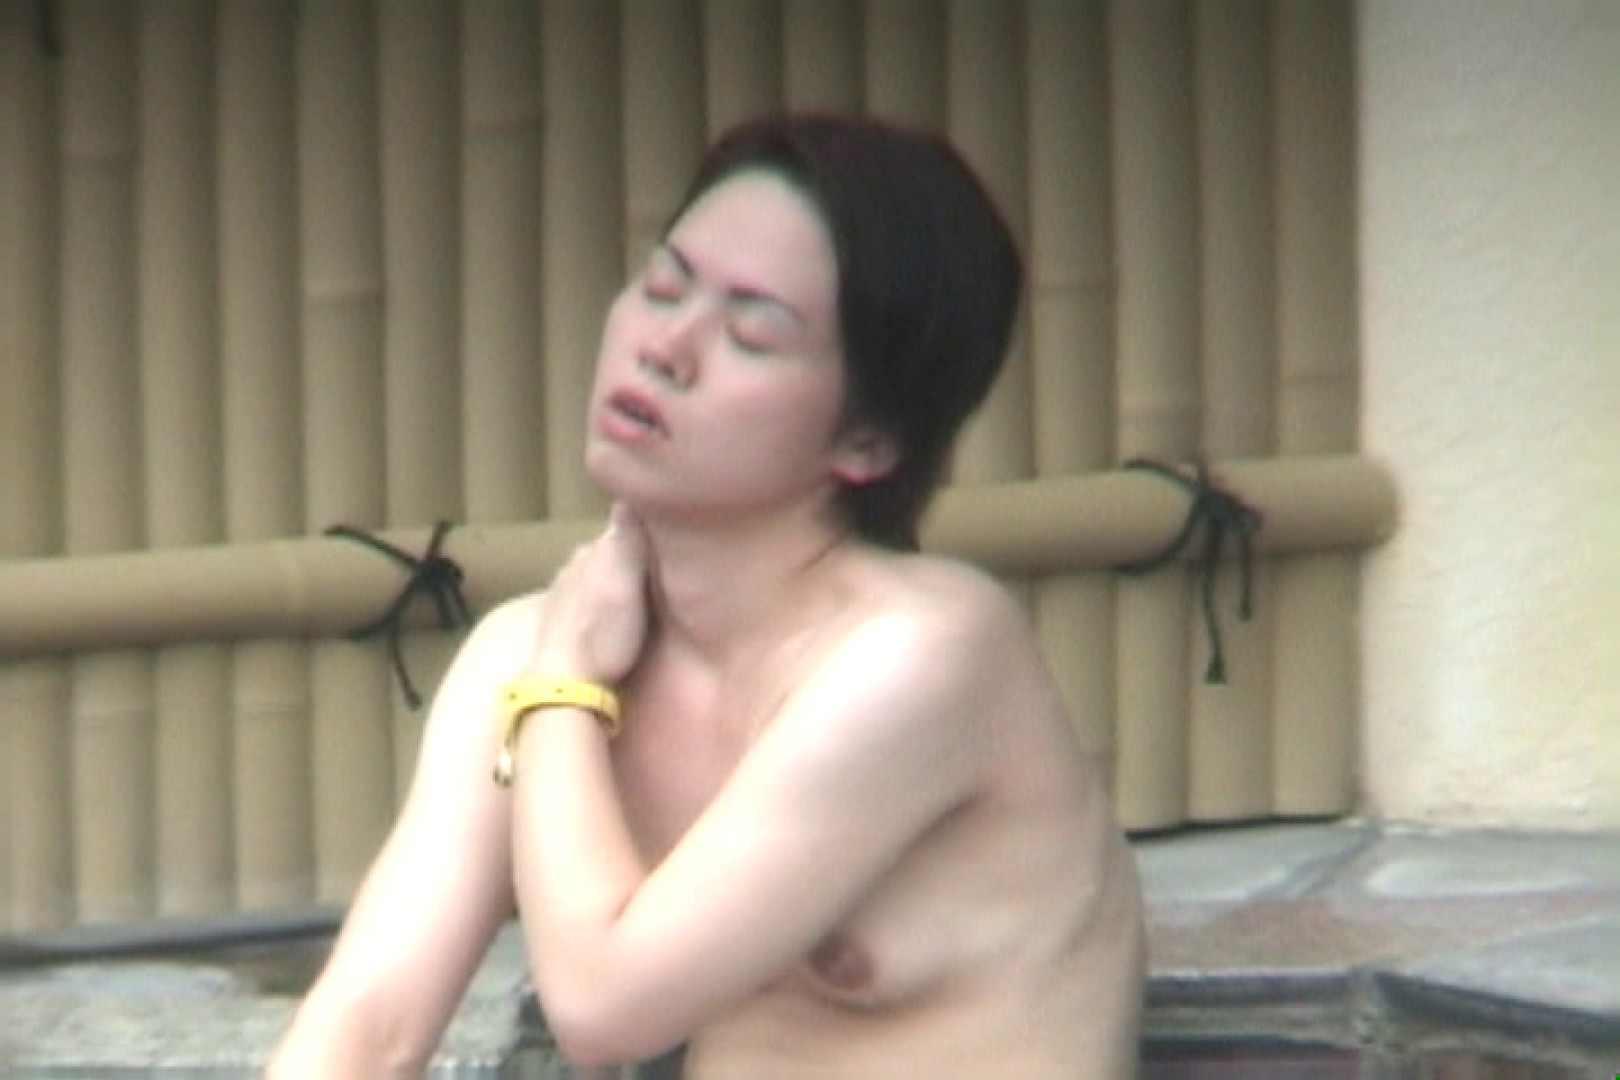 Aquaな露天風呂Vol.558 OLセックス | 盗撮  81画像 52